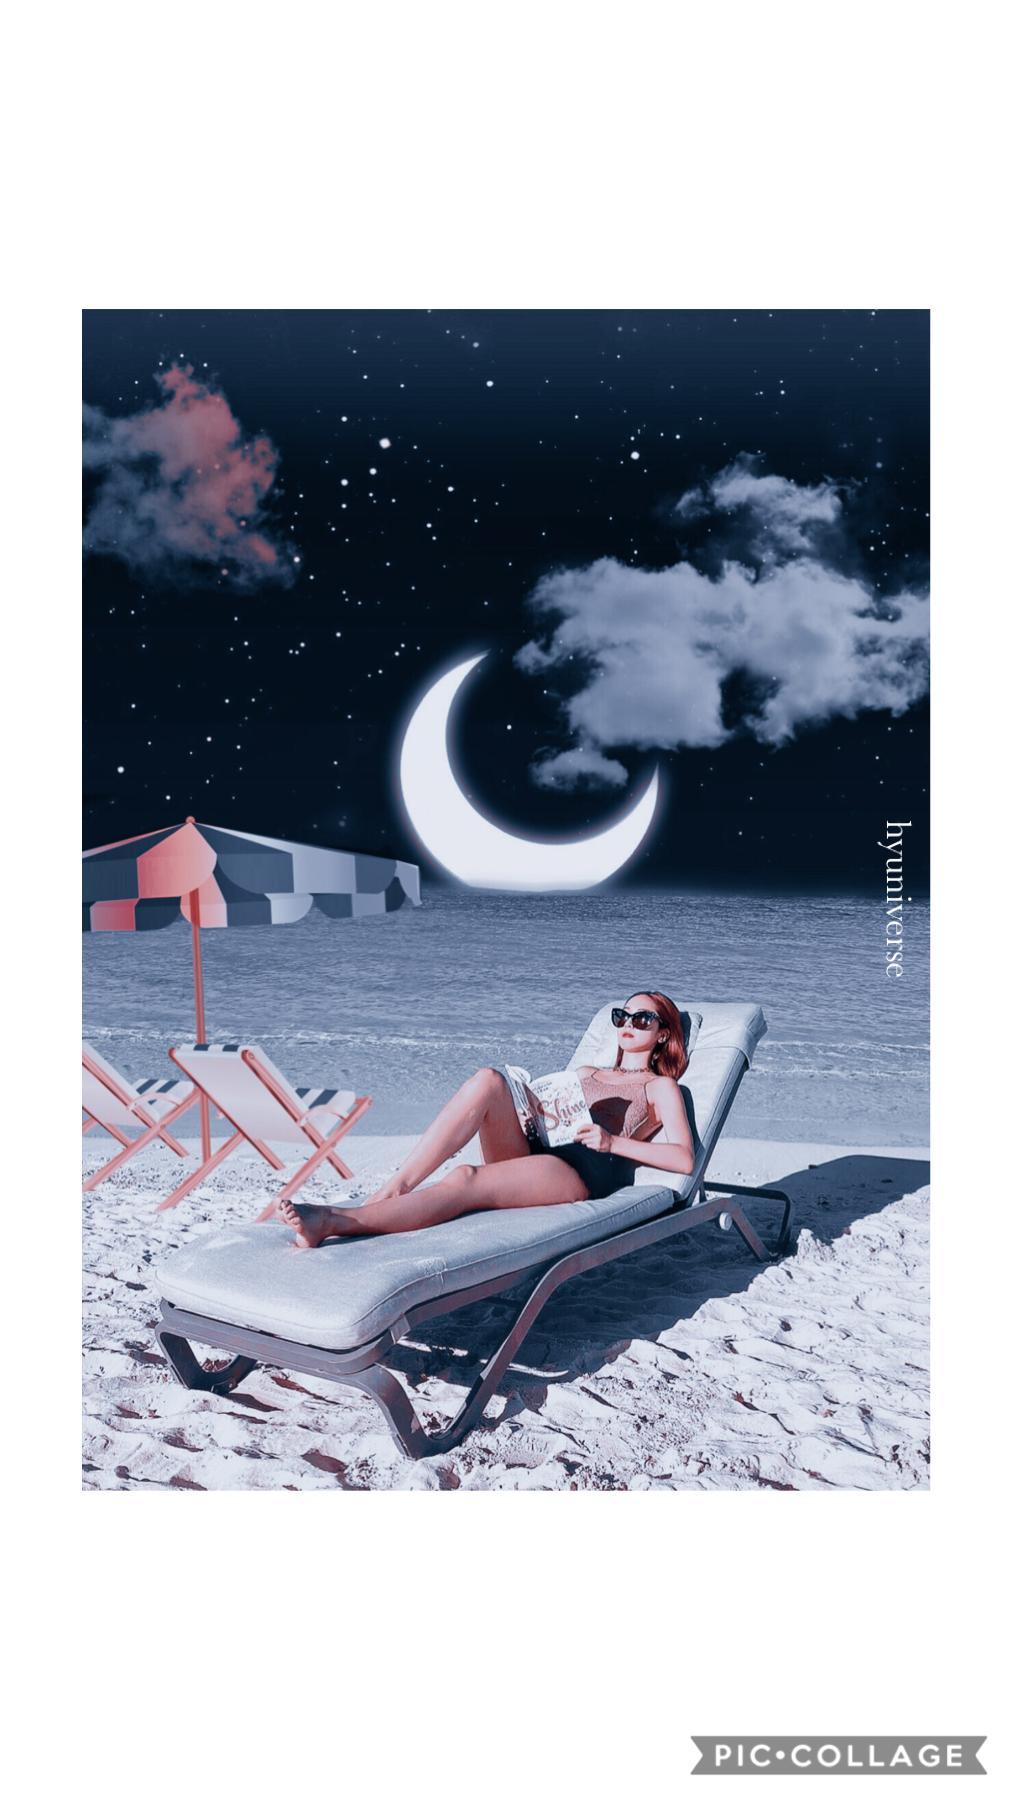 inspired by hotel del luna 🖤